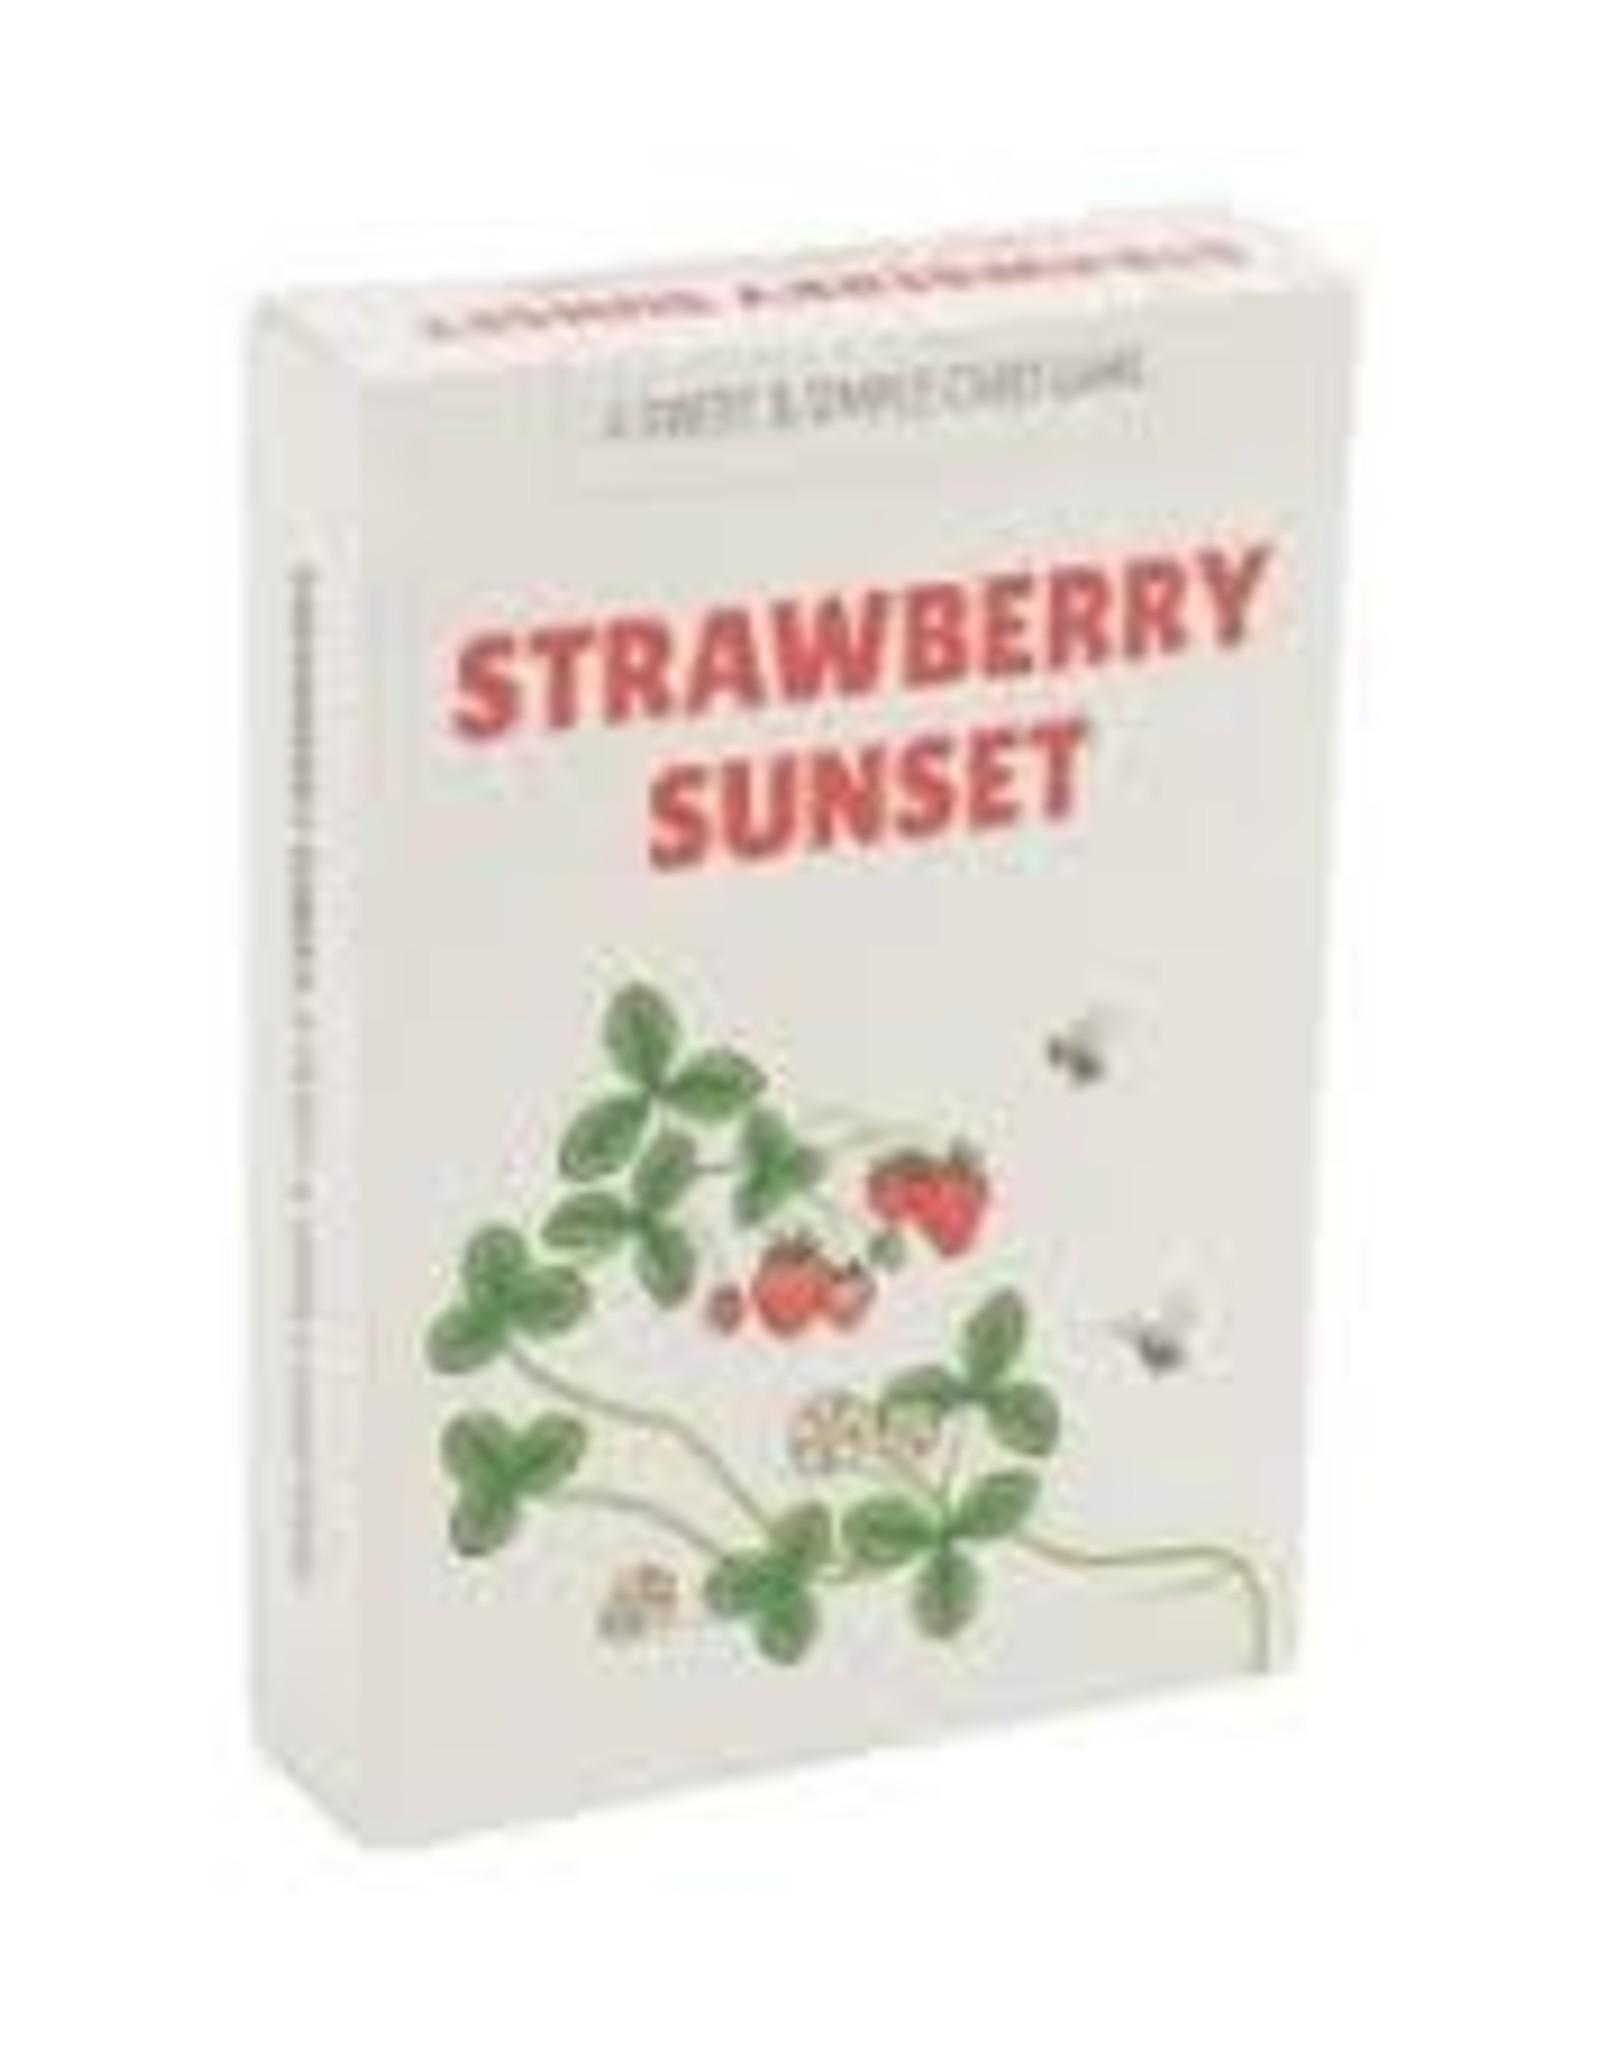 Strawberry Sunset